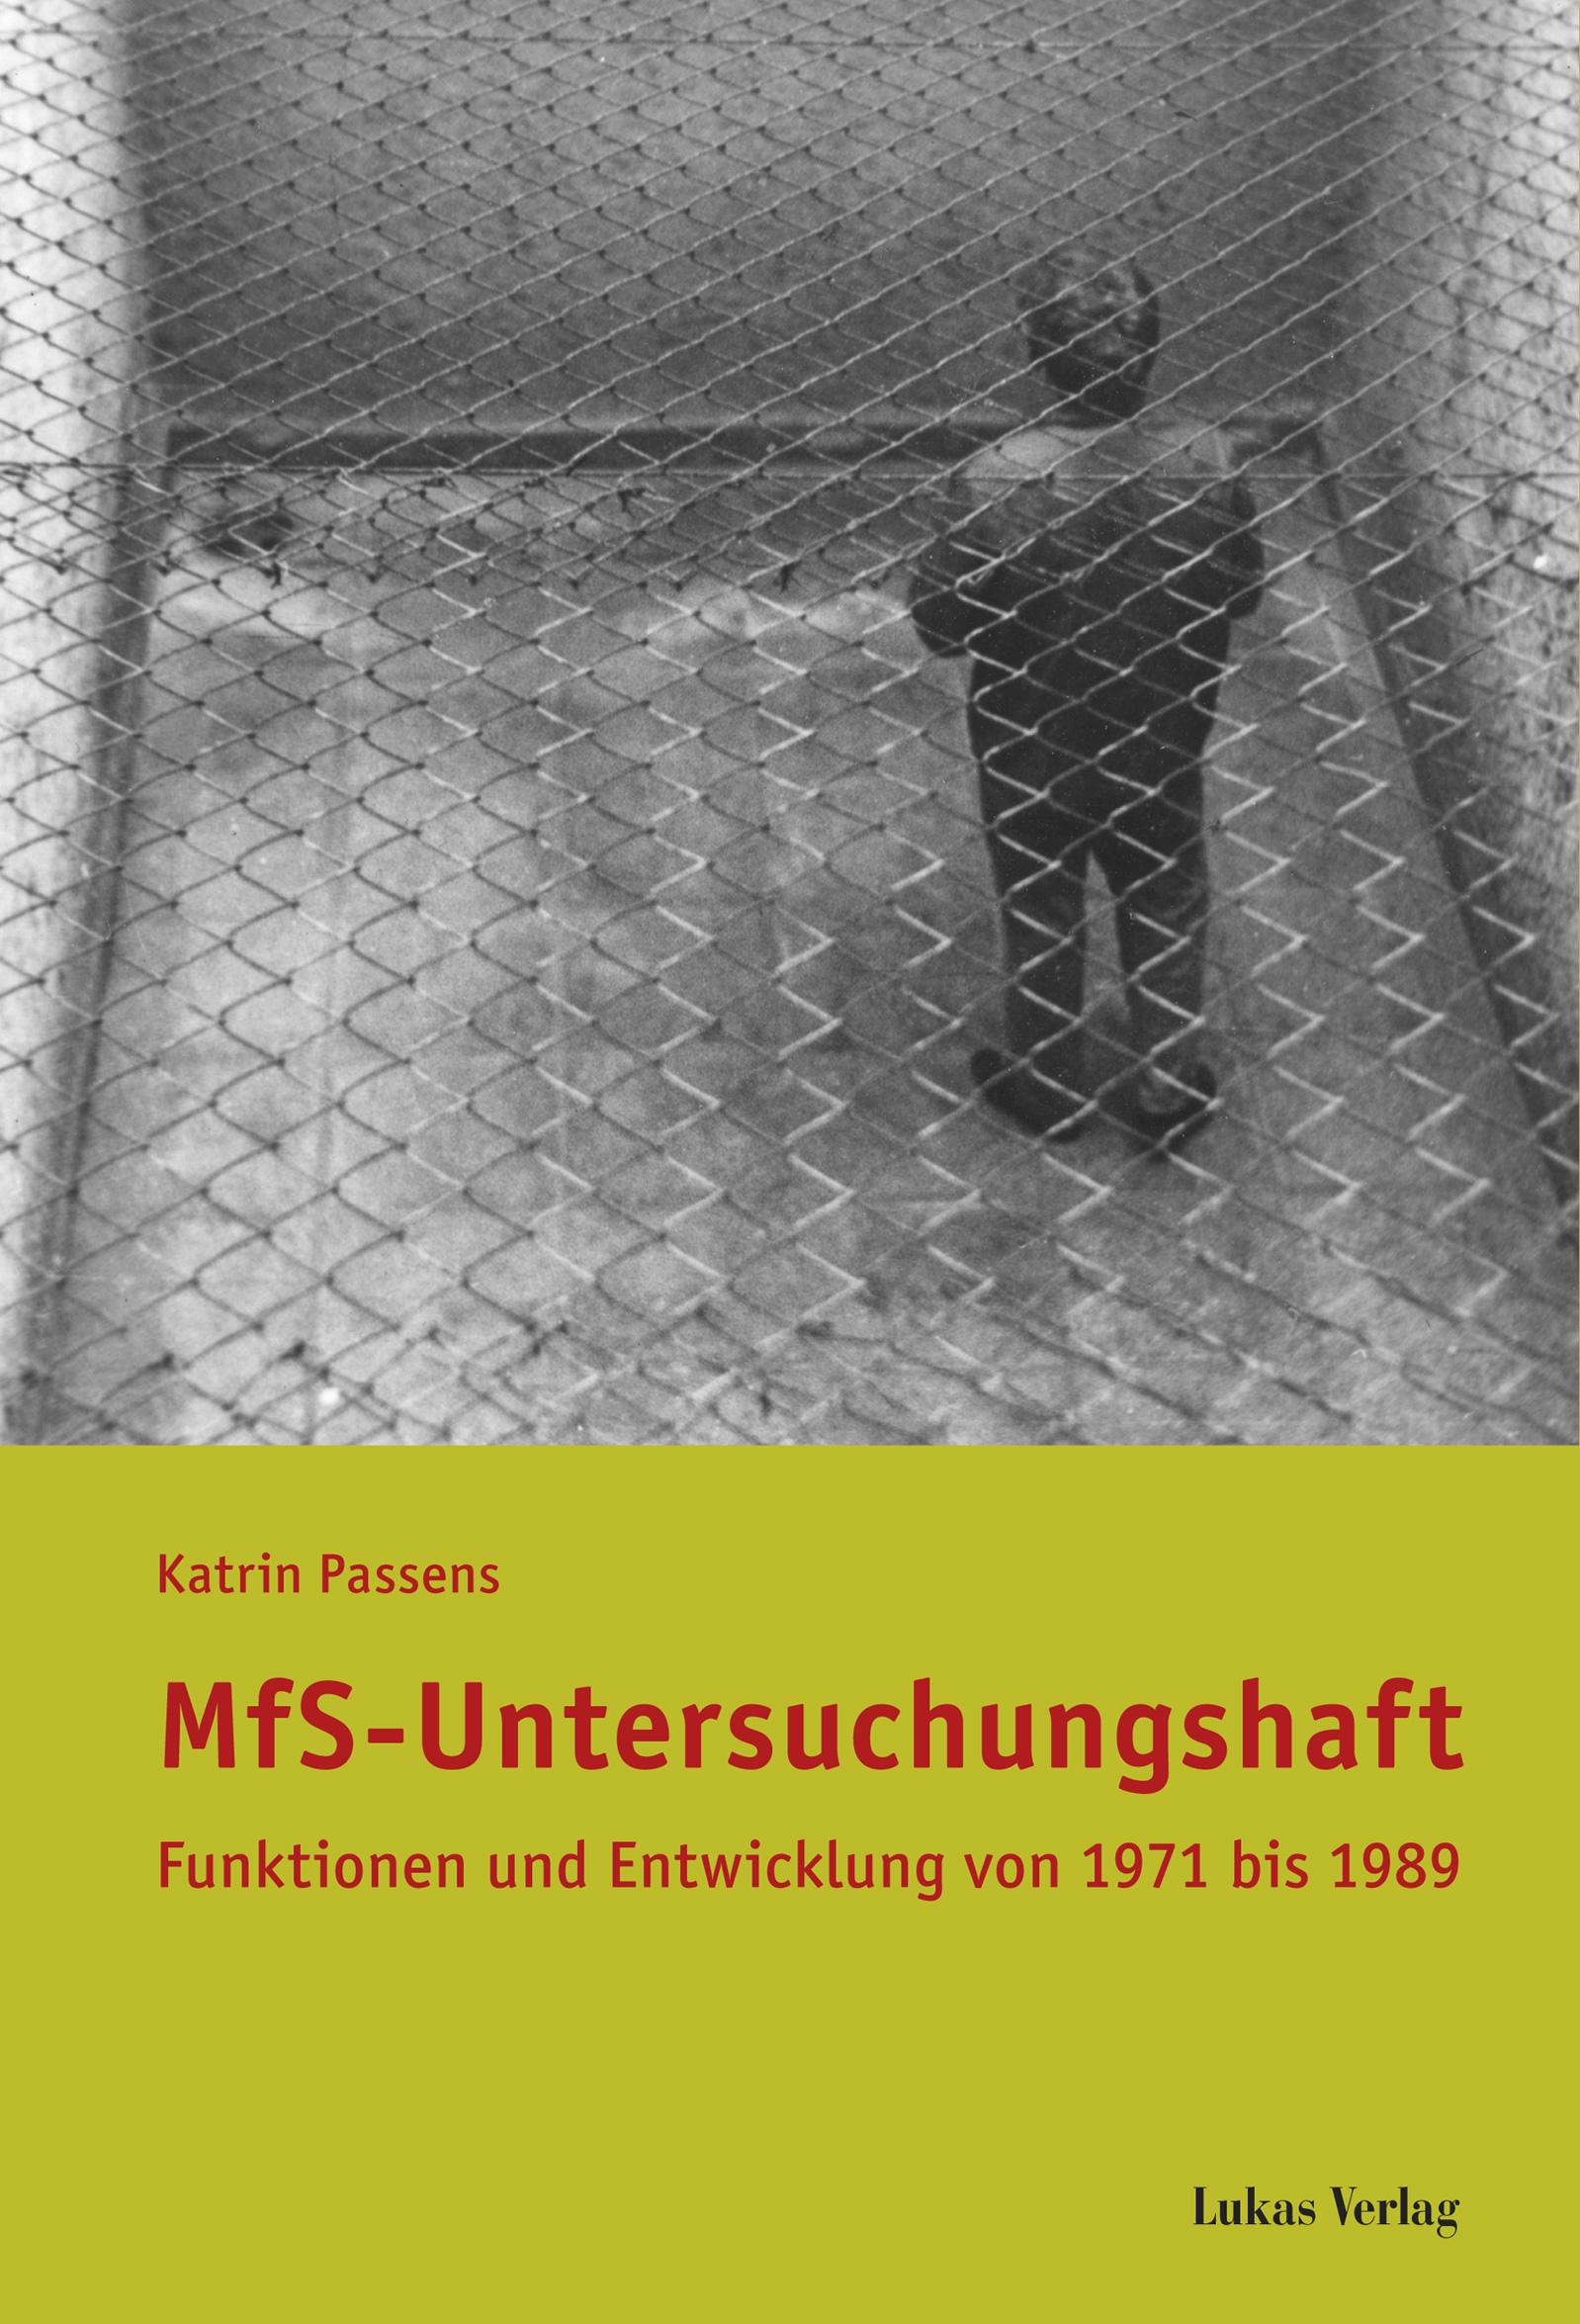 MfS-Untersuchungshaft-Katrin-Passens